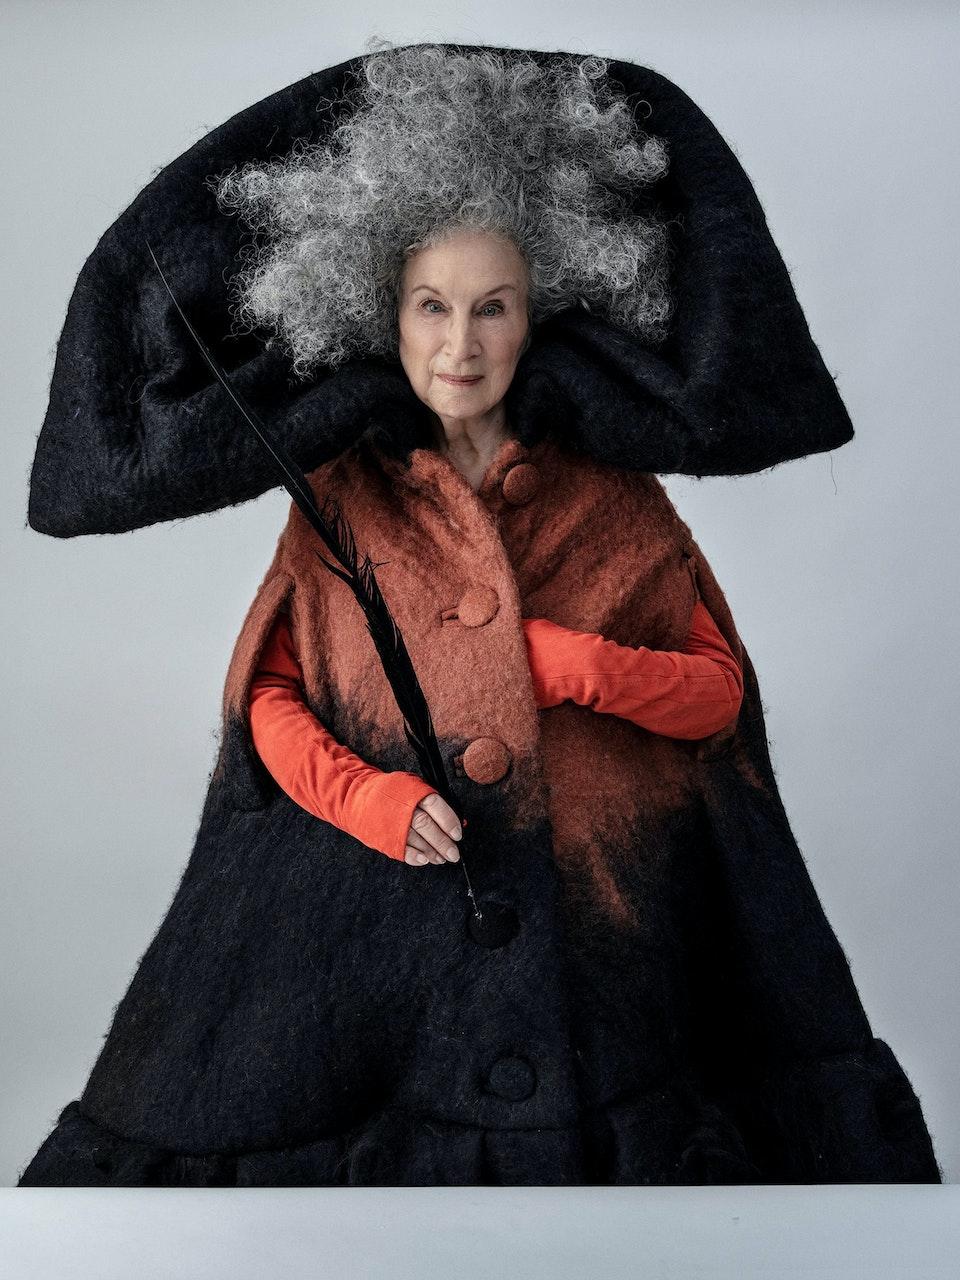 Margaret Atwood, Sunday Times, London, 2019 © Tim Walker Studio, Courtesy Michael Hoppen Gallery